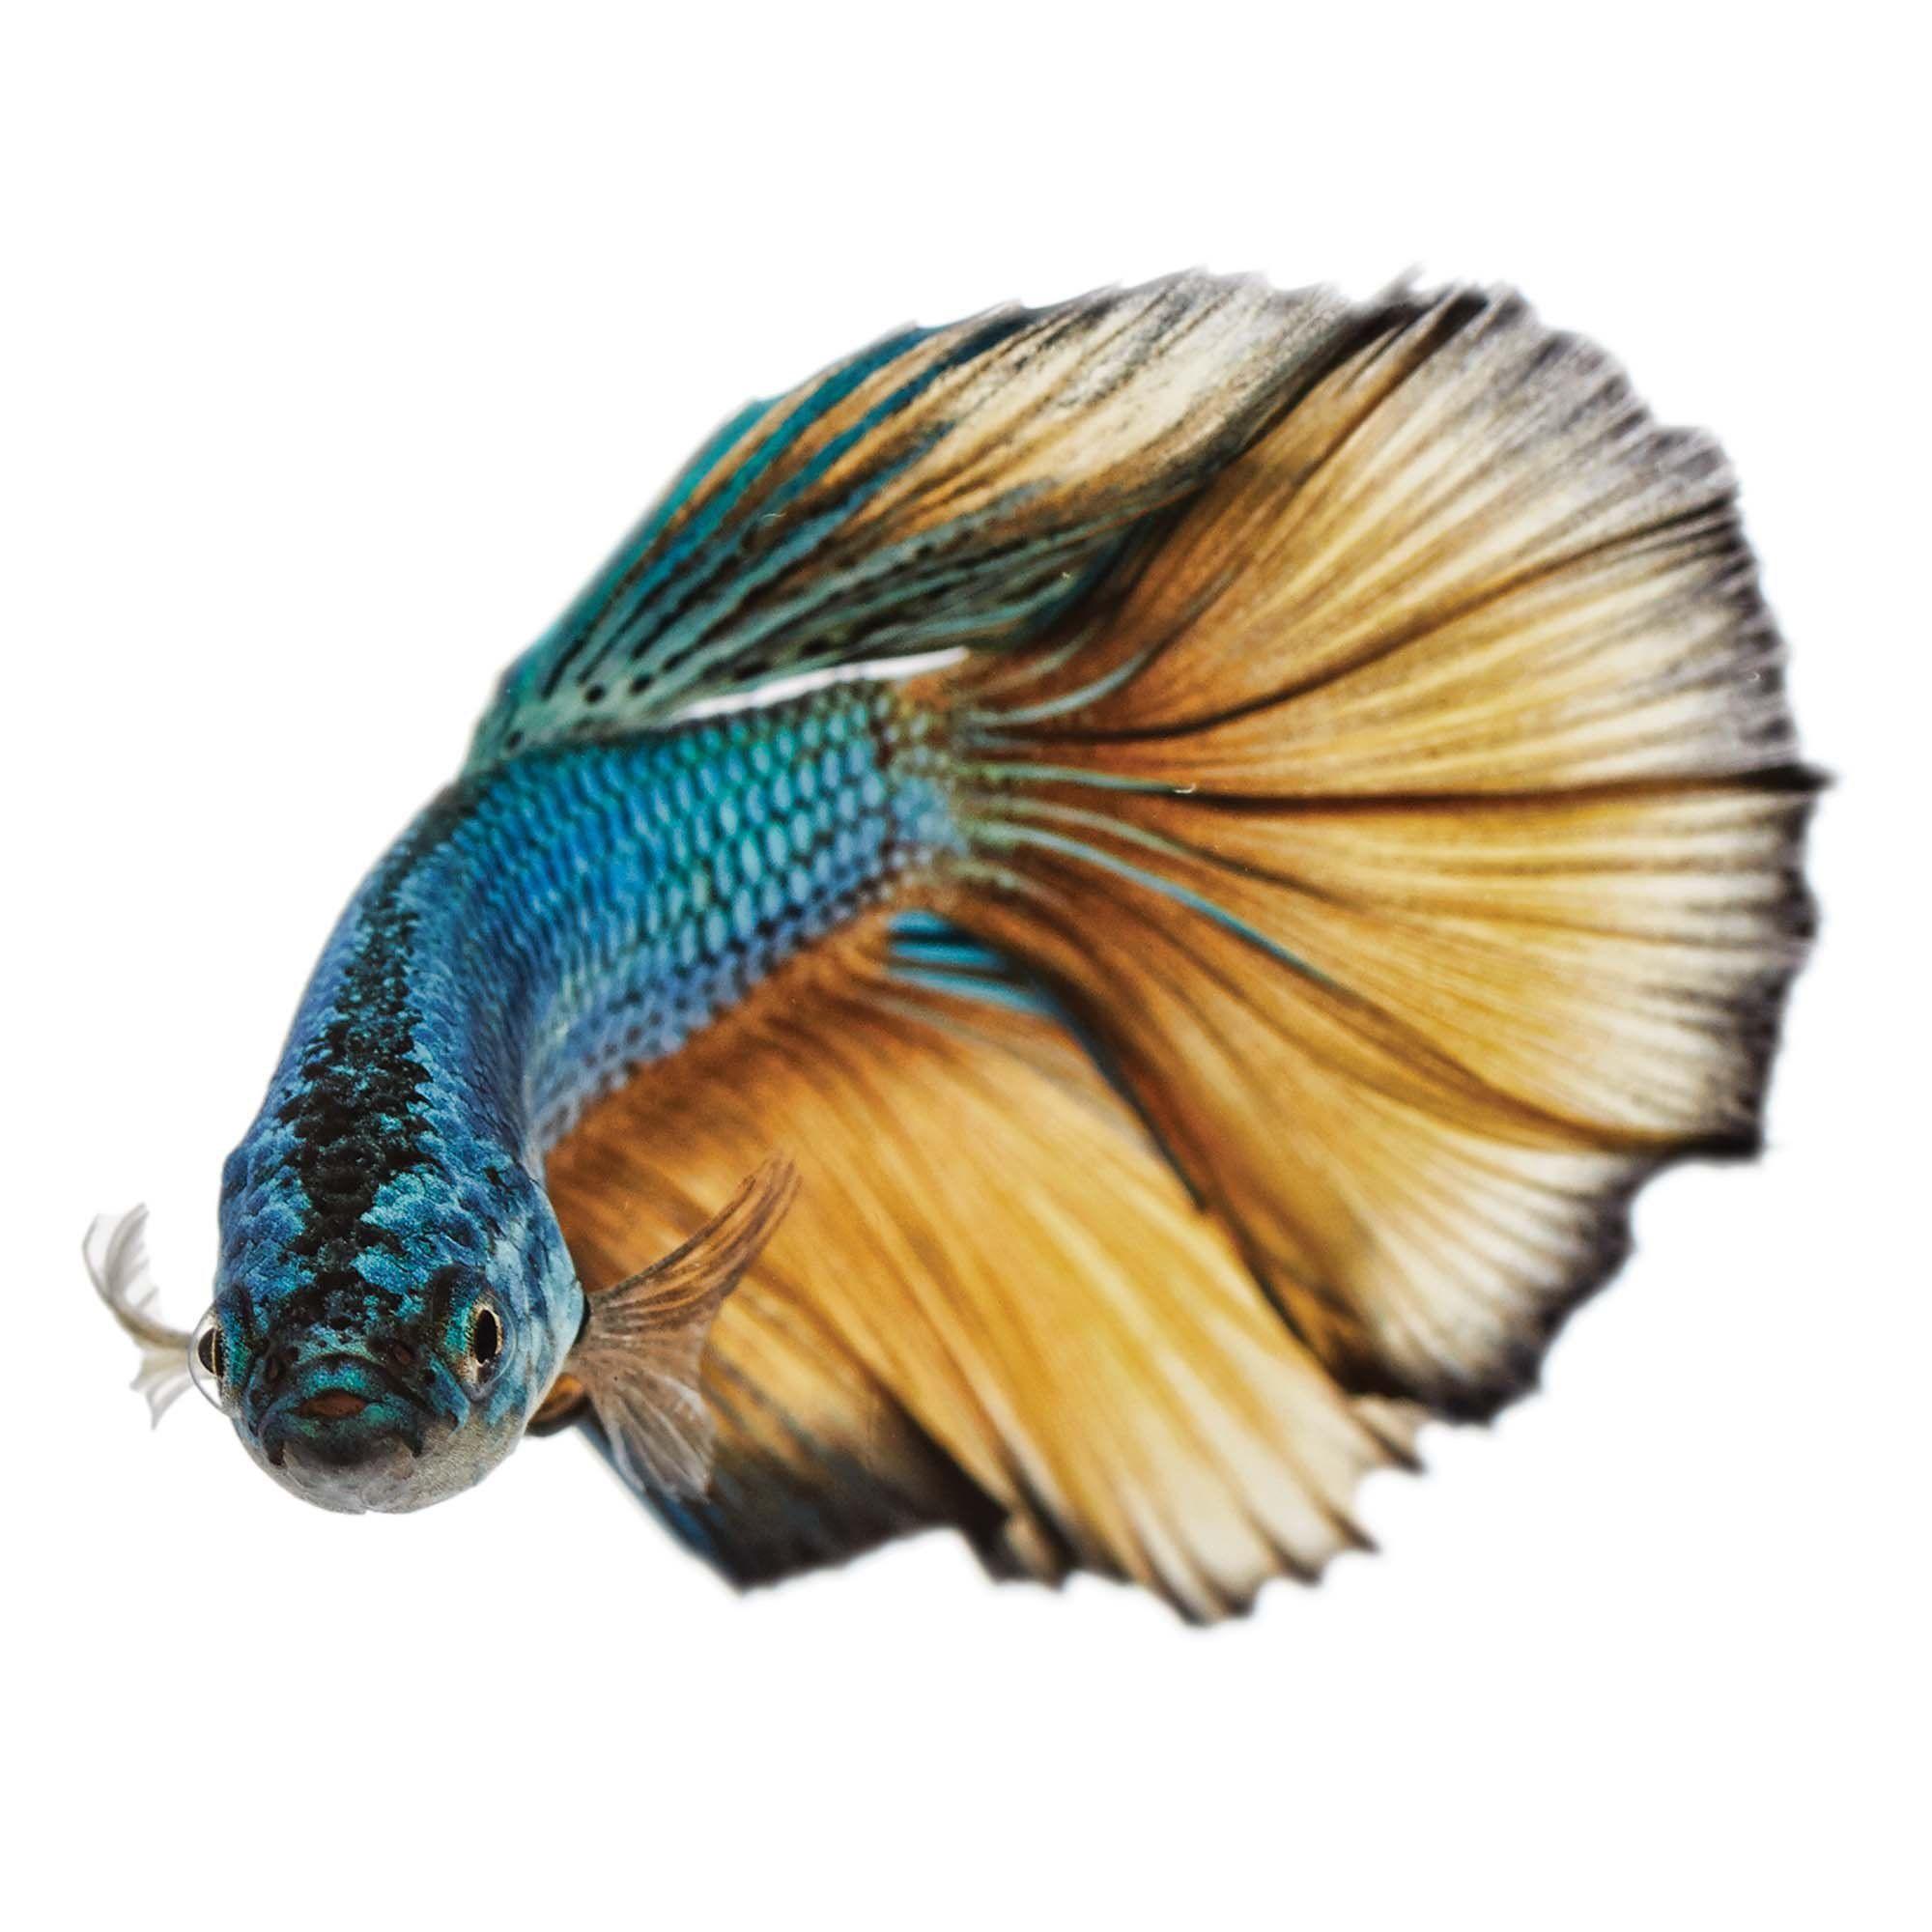 Male Paradise Betta For Sale Order Online Petco Saltwater Aquarium Fish Betta Fish Tank Pet Fish